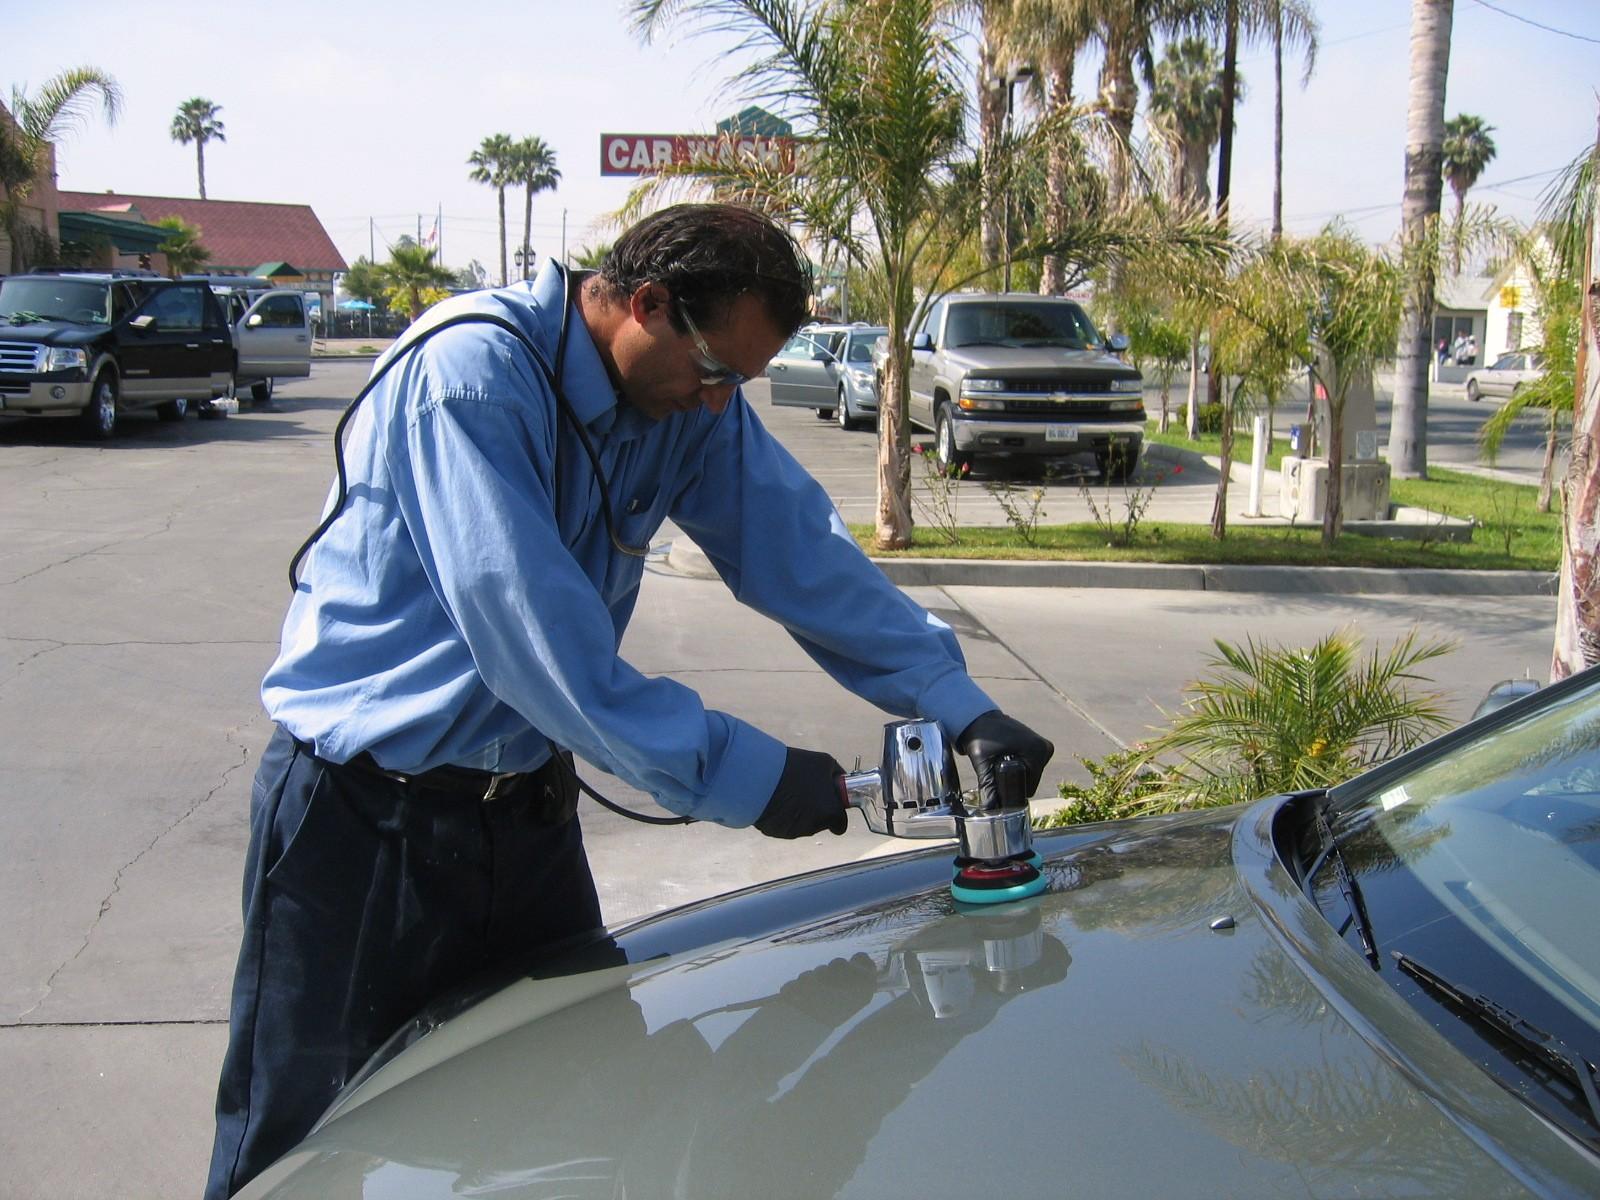 Car Wash Depot Hemet CA YP